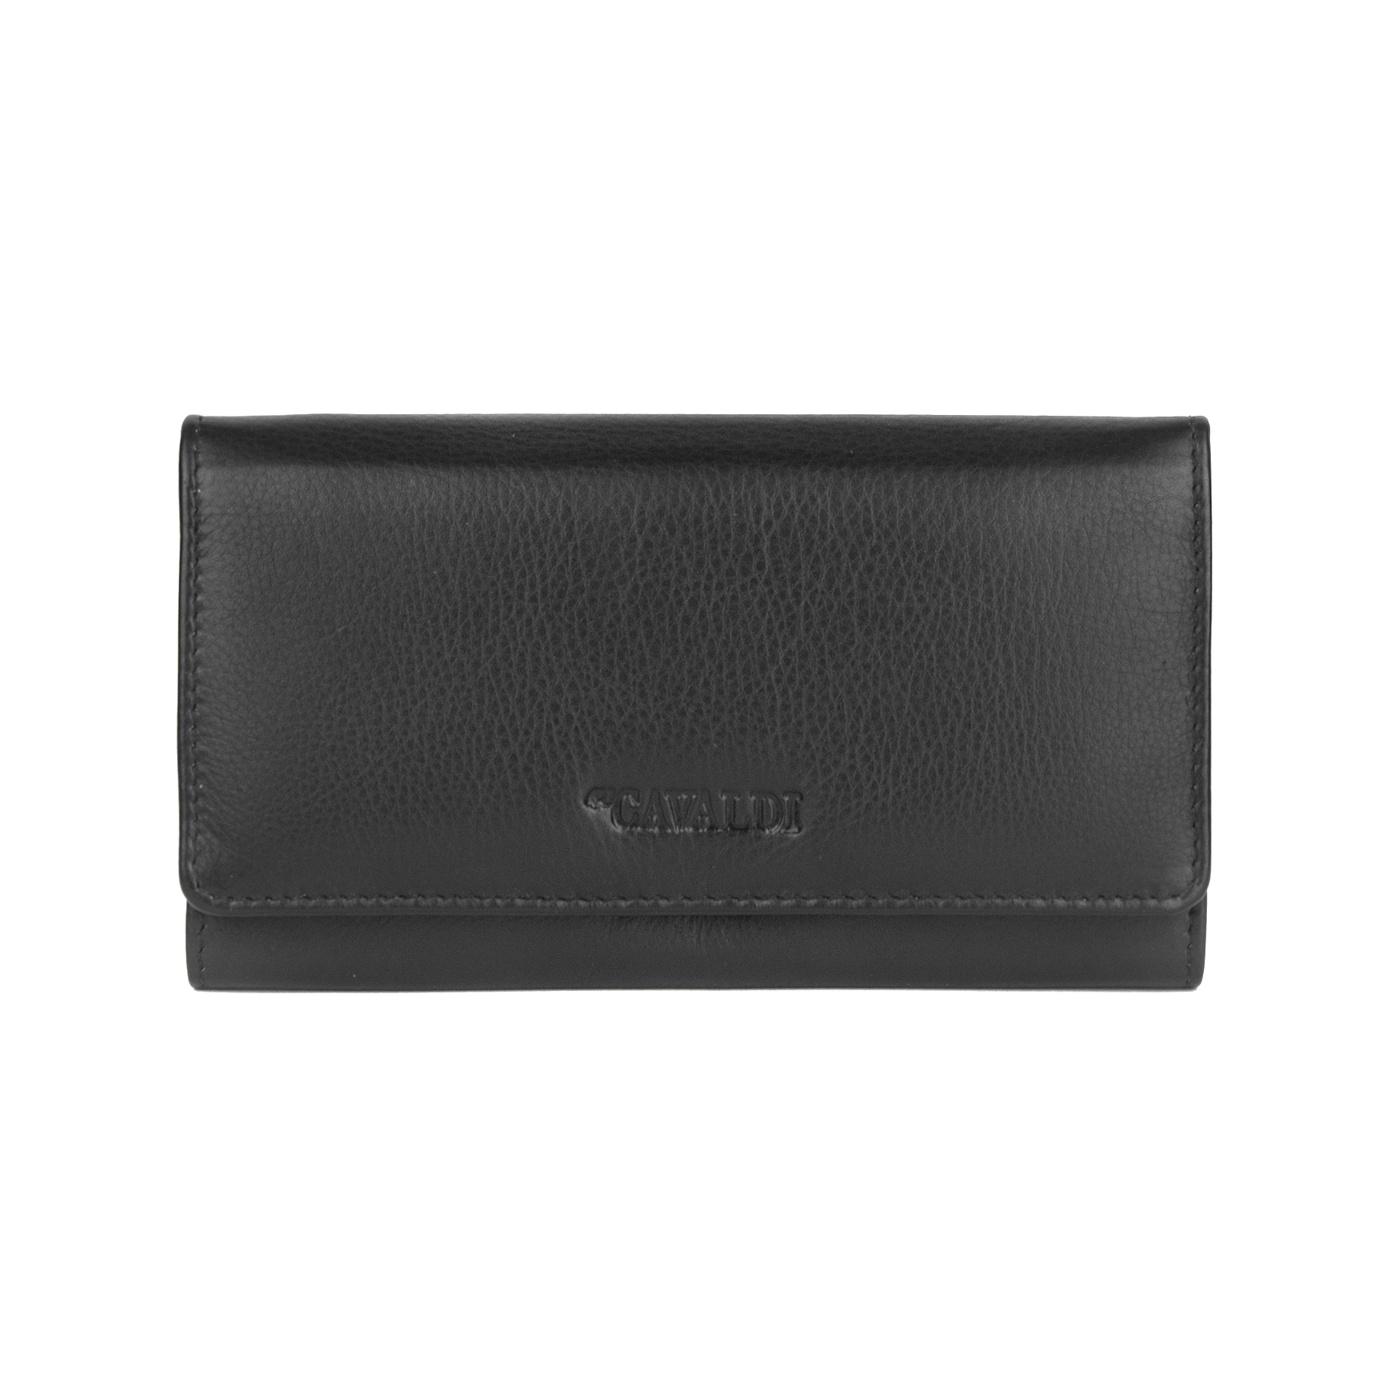 Damski portfel ze skóry 4U Cavaldi - czarny